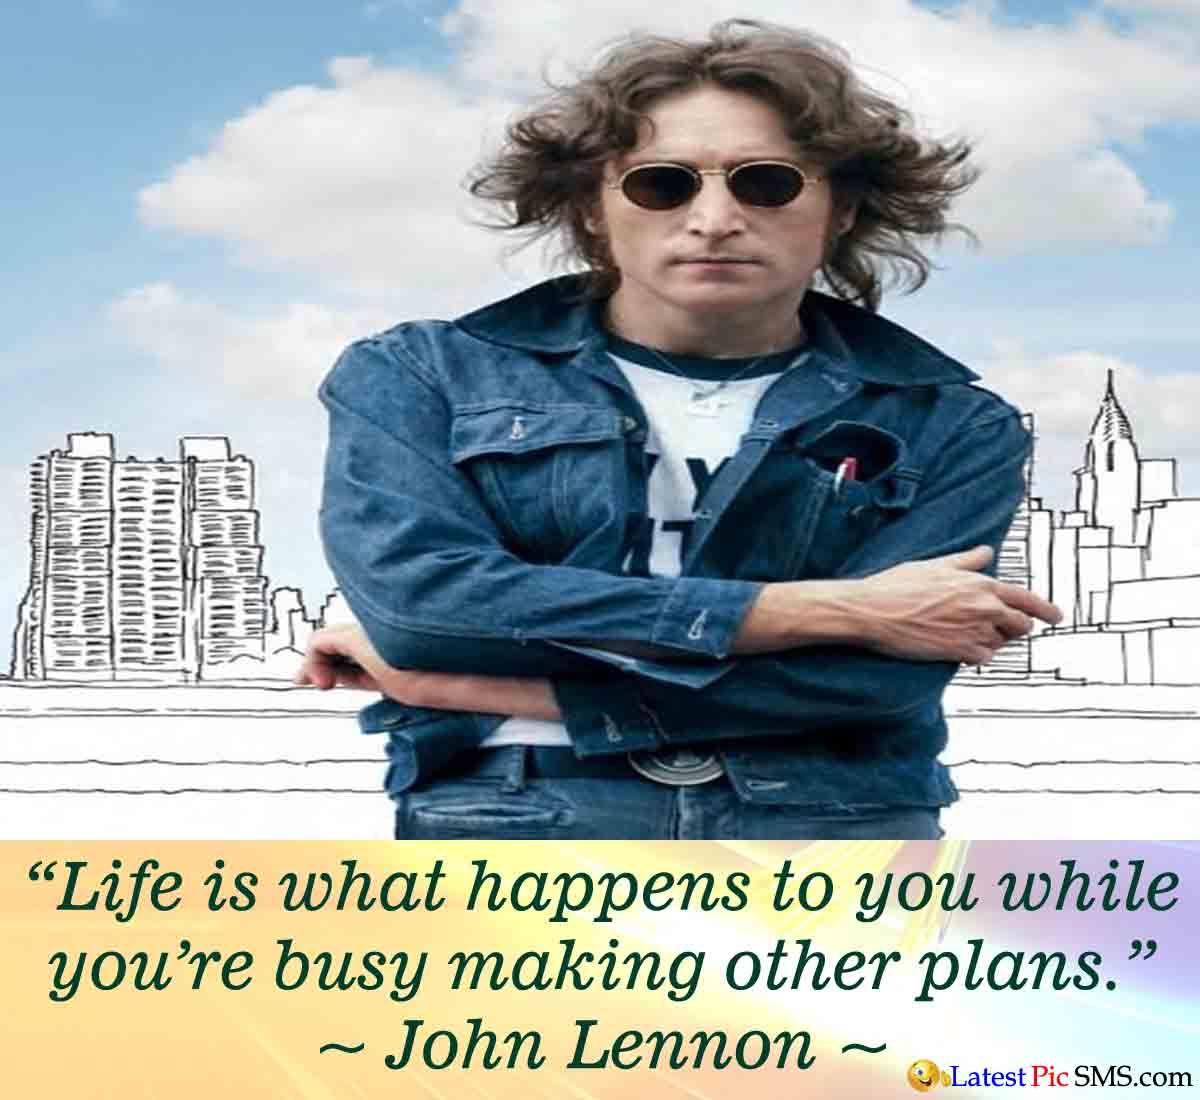 John Lennon life quote